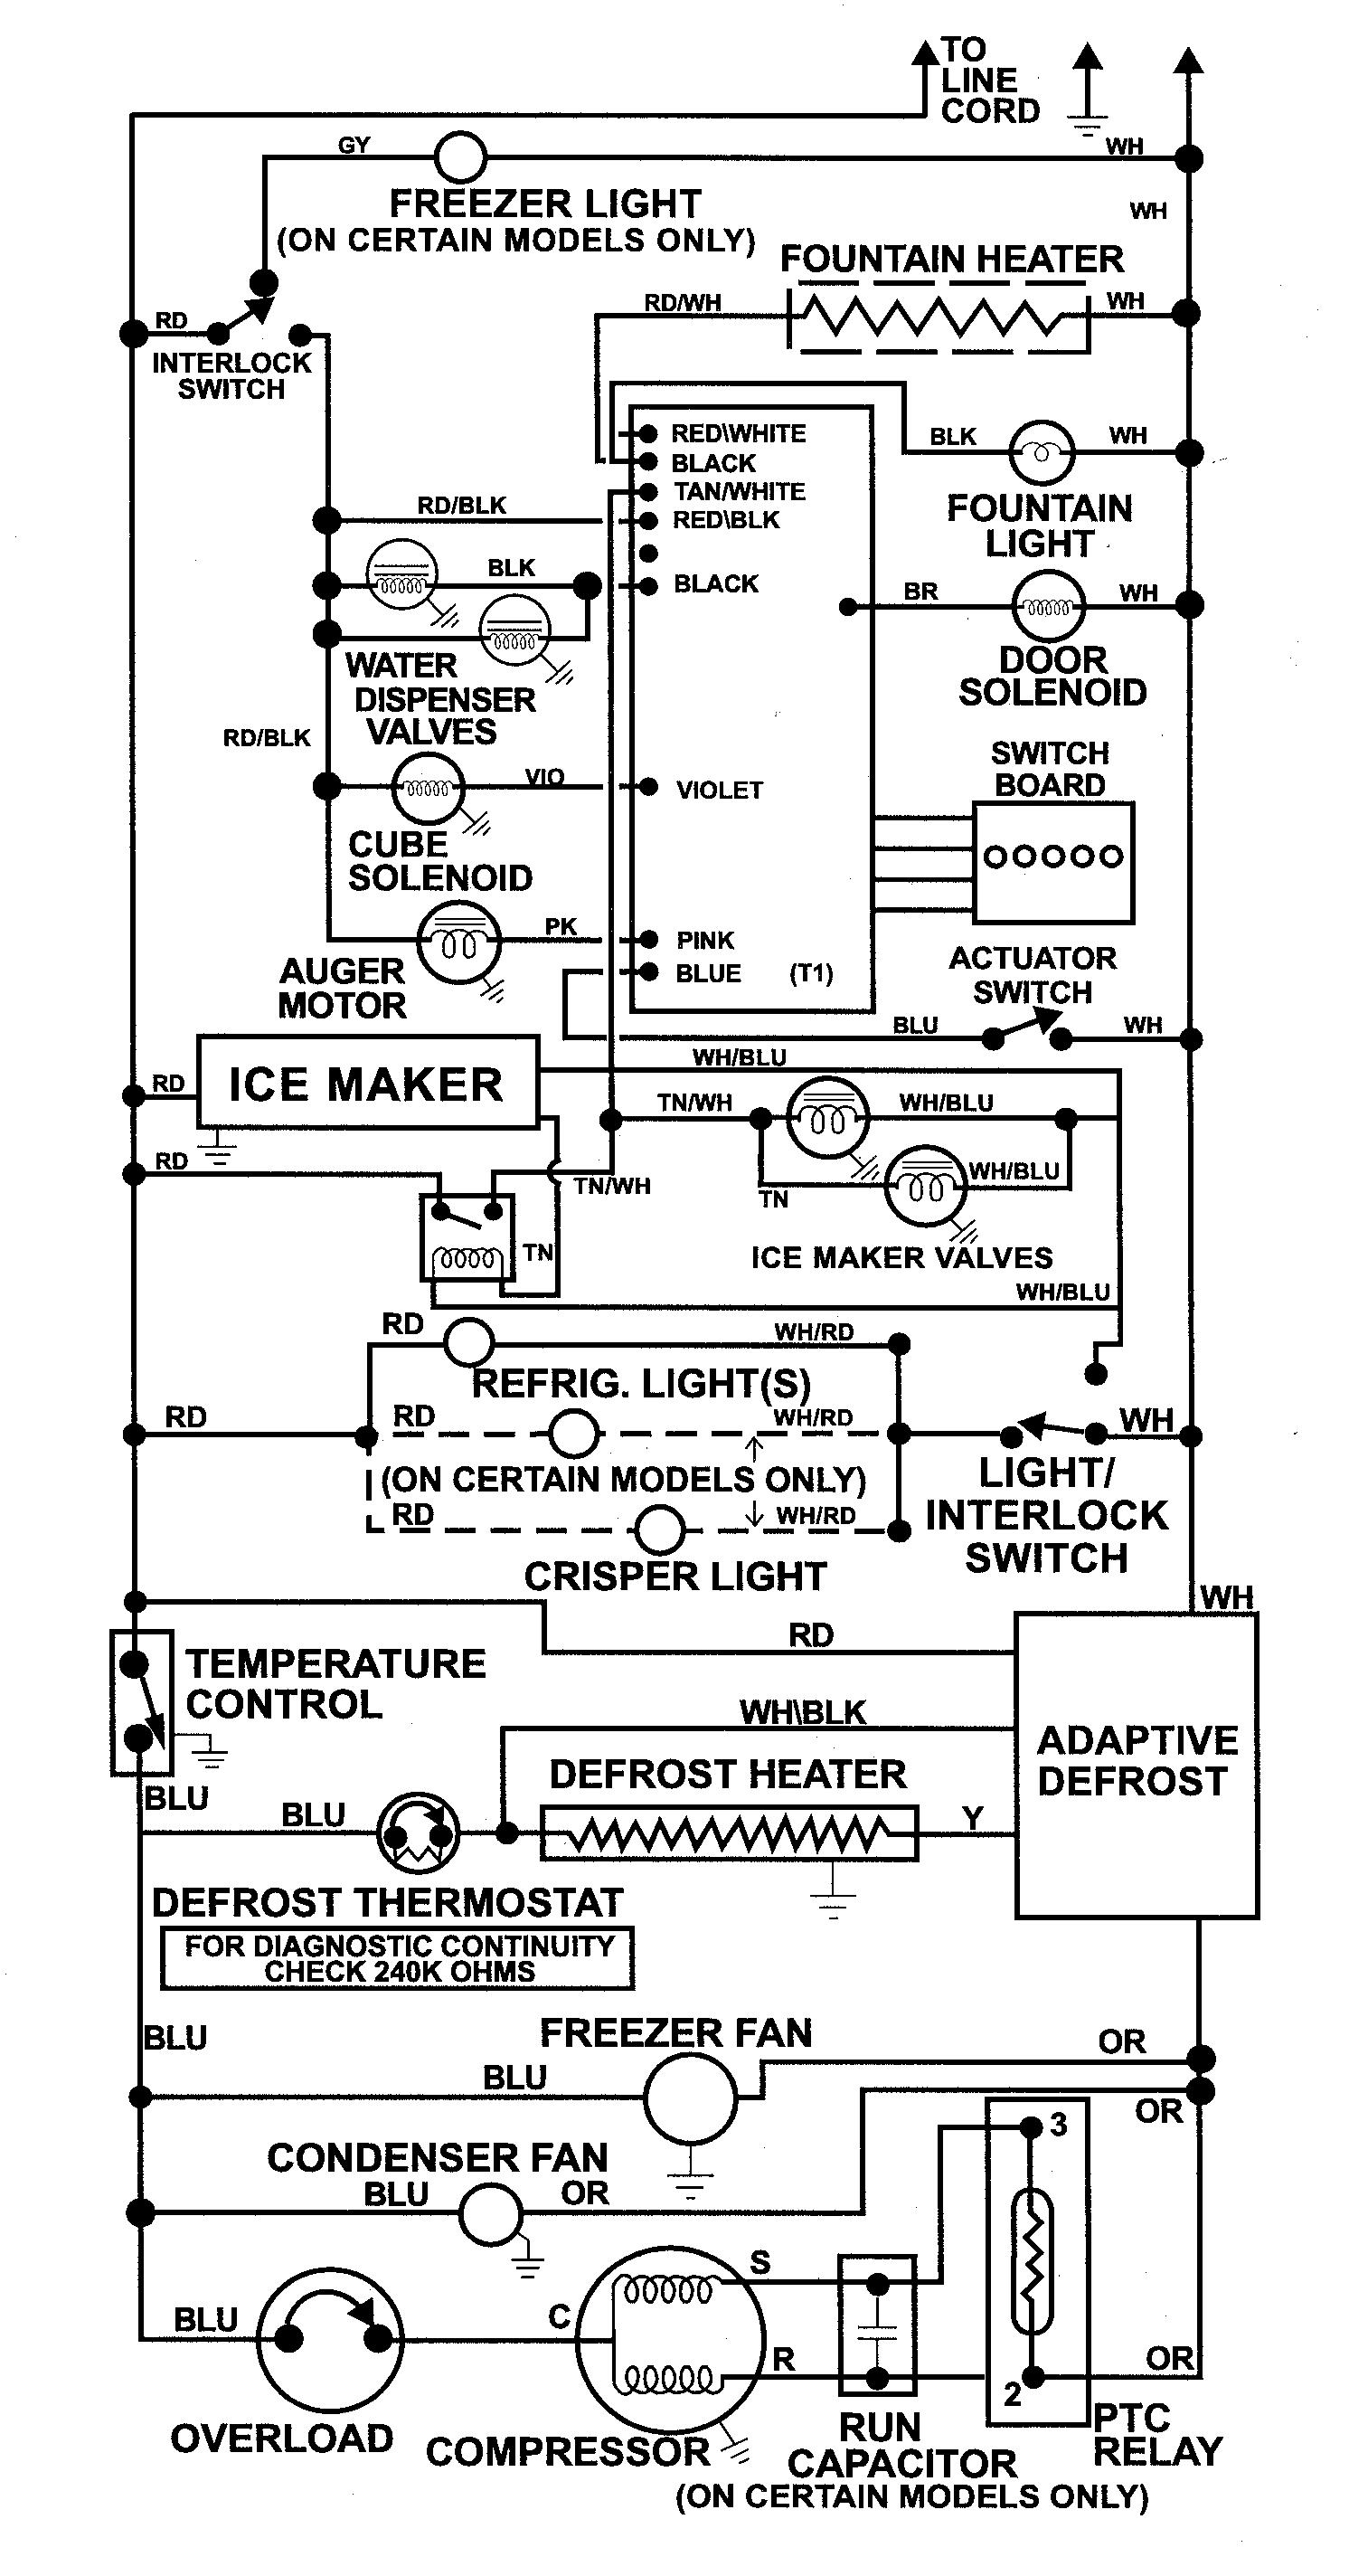 medium resolution of maytag refrigerator schematic wiring diagram for you looking for maytag model msd2656deq side by side refrigerator